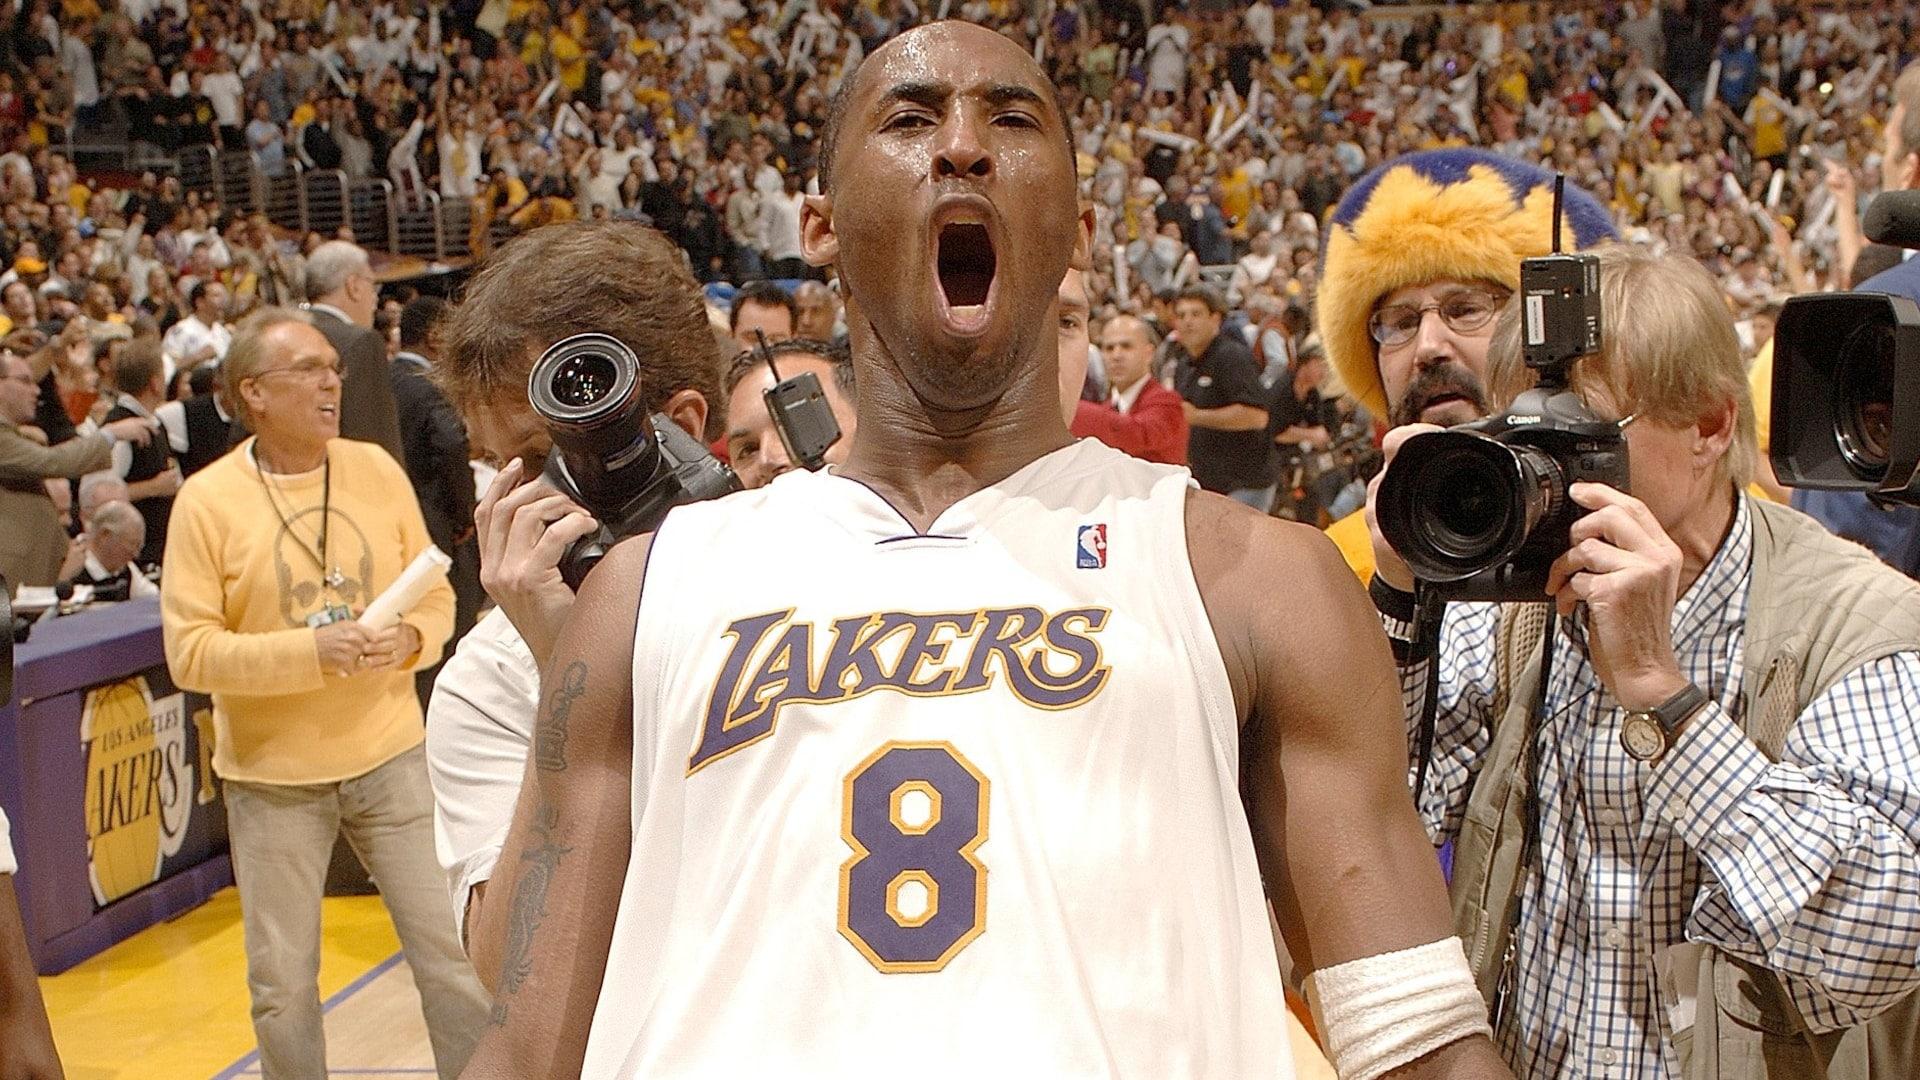 Big scoring performances, series-clinchers mark exciting week on NBA TV